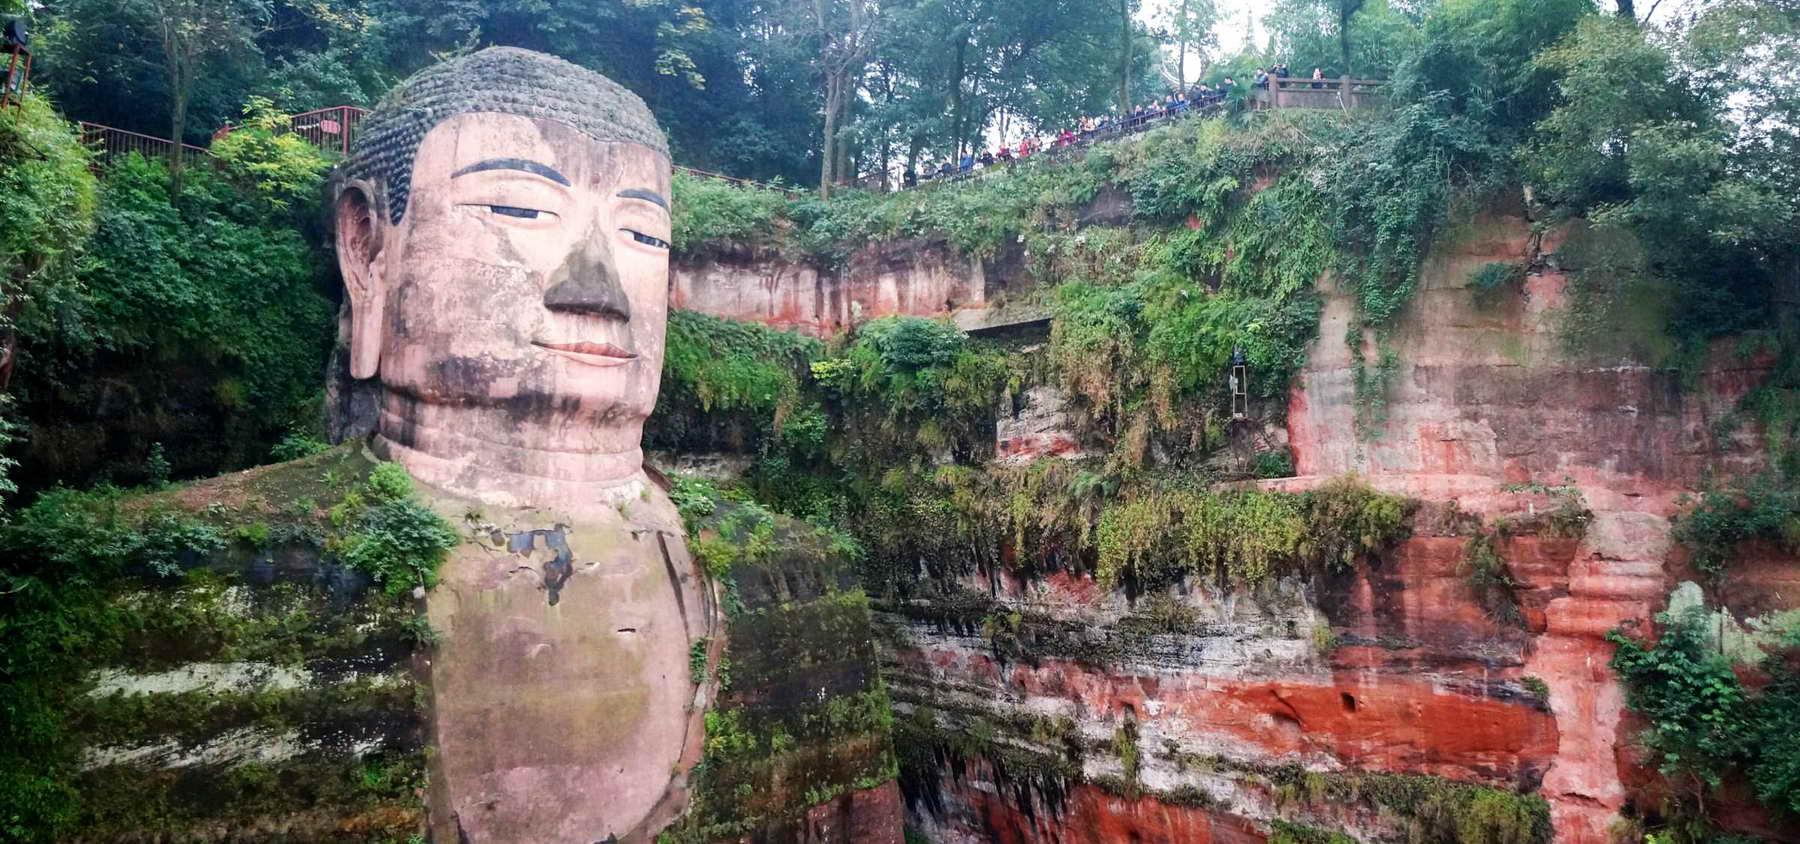 2-Day Giant Panda and Giant Buddha Tour